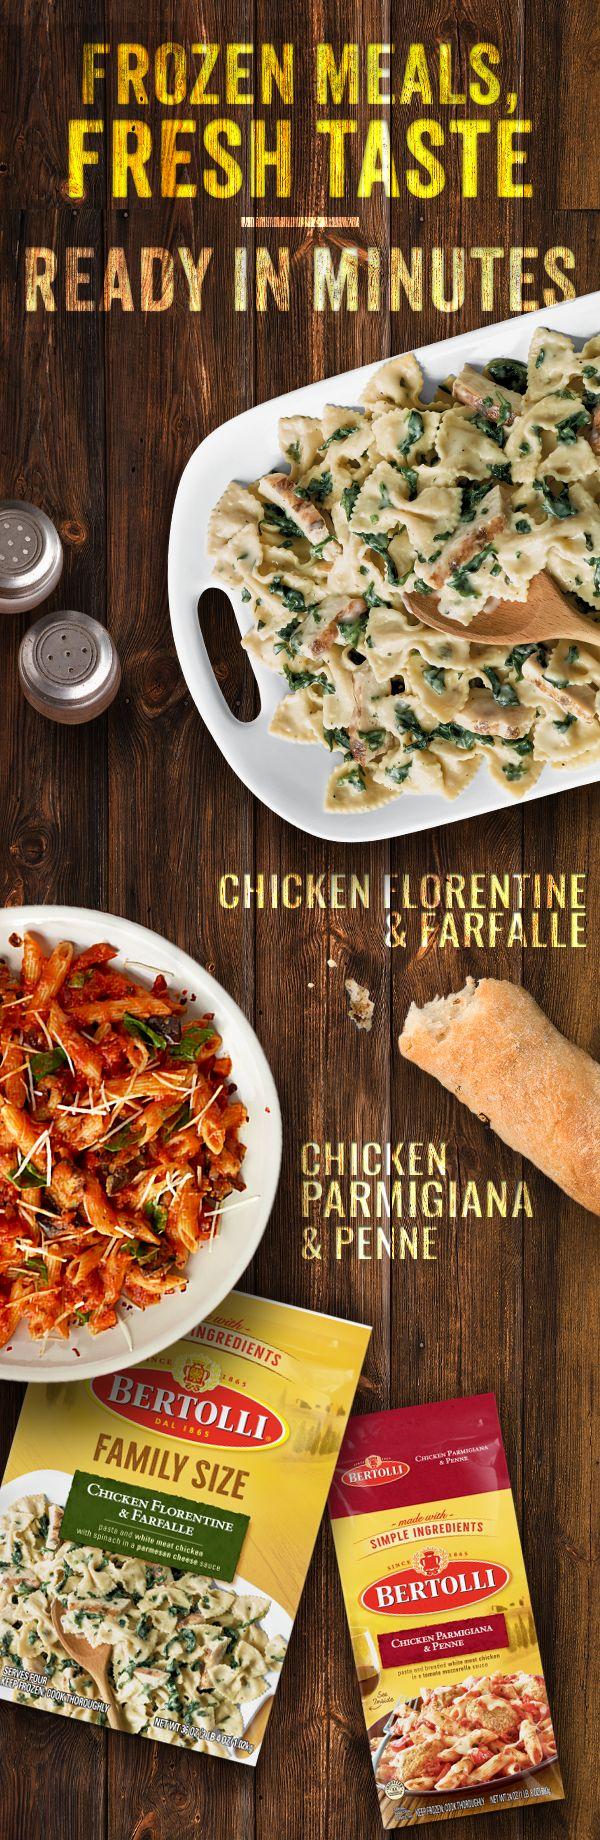 Quick & Easy Recipes 2